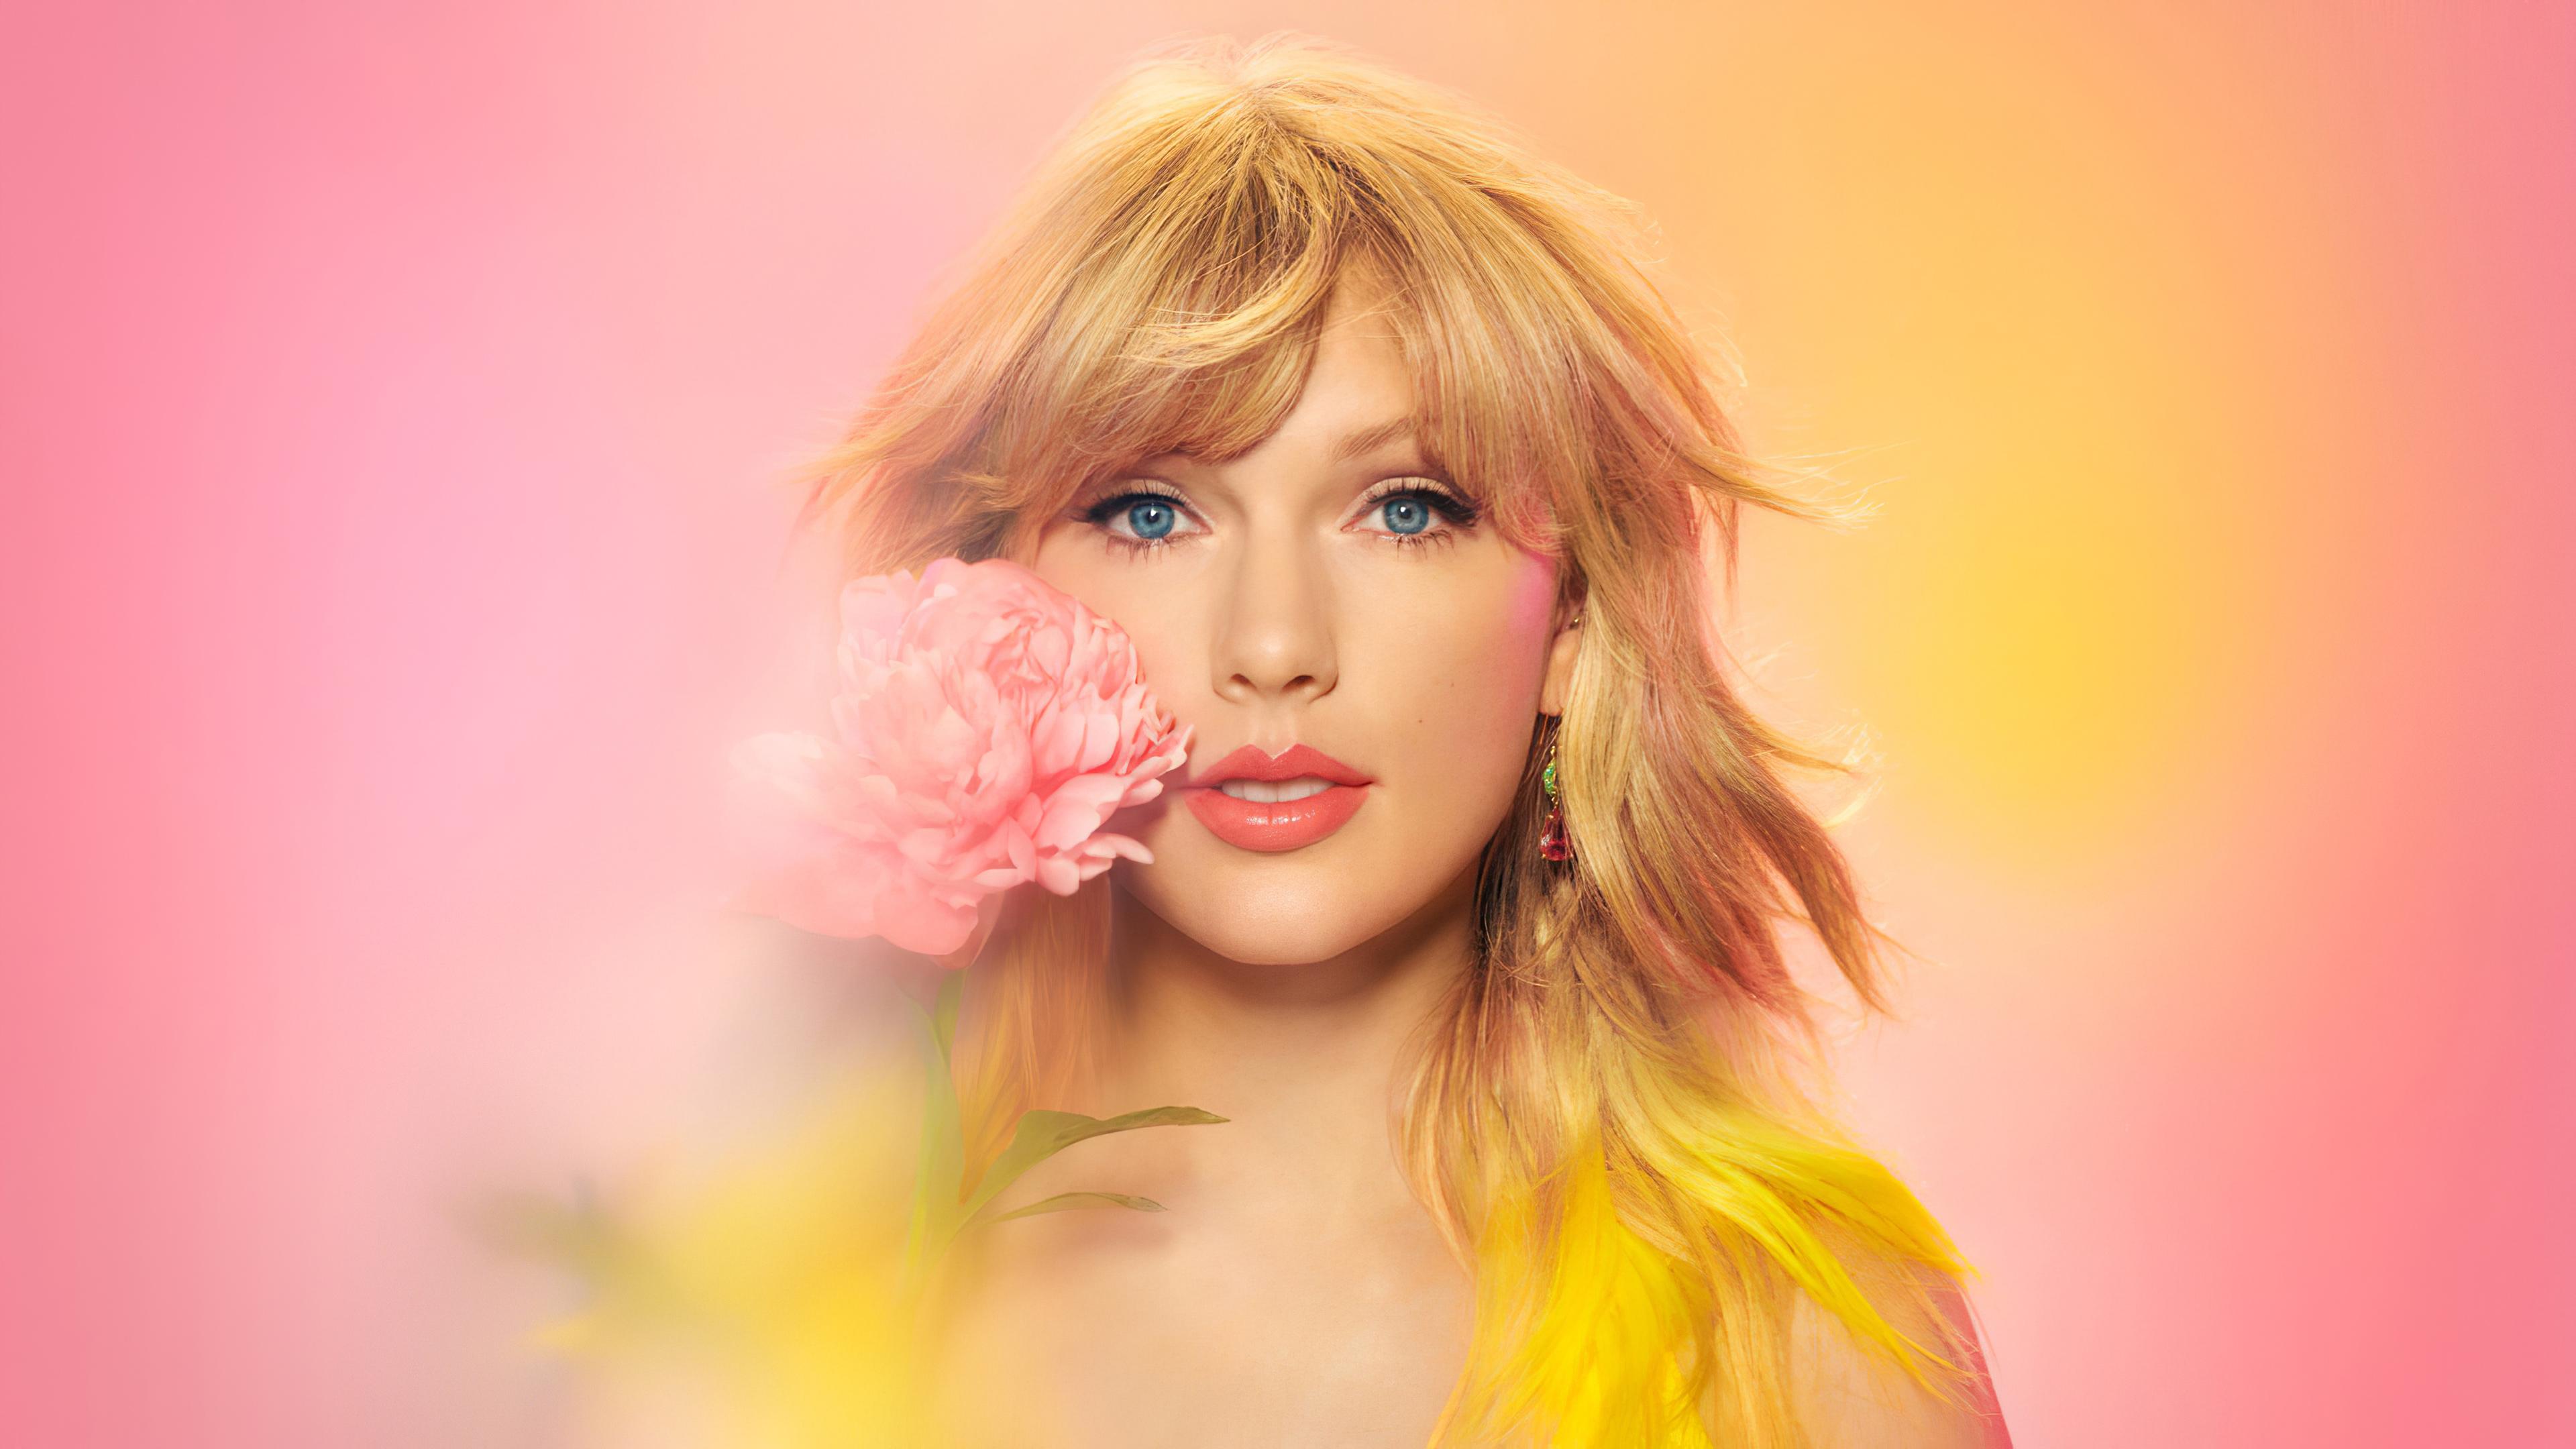 39 Taylor Swift 2020 Wallpapers On Wallpapersafari